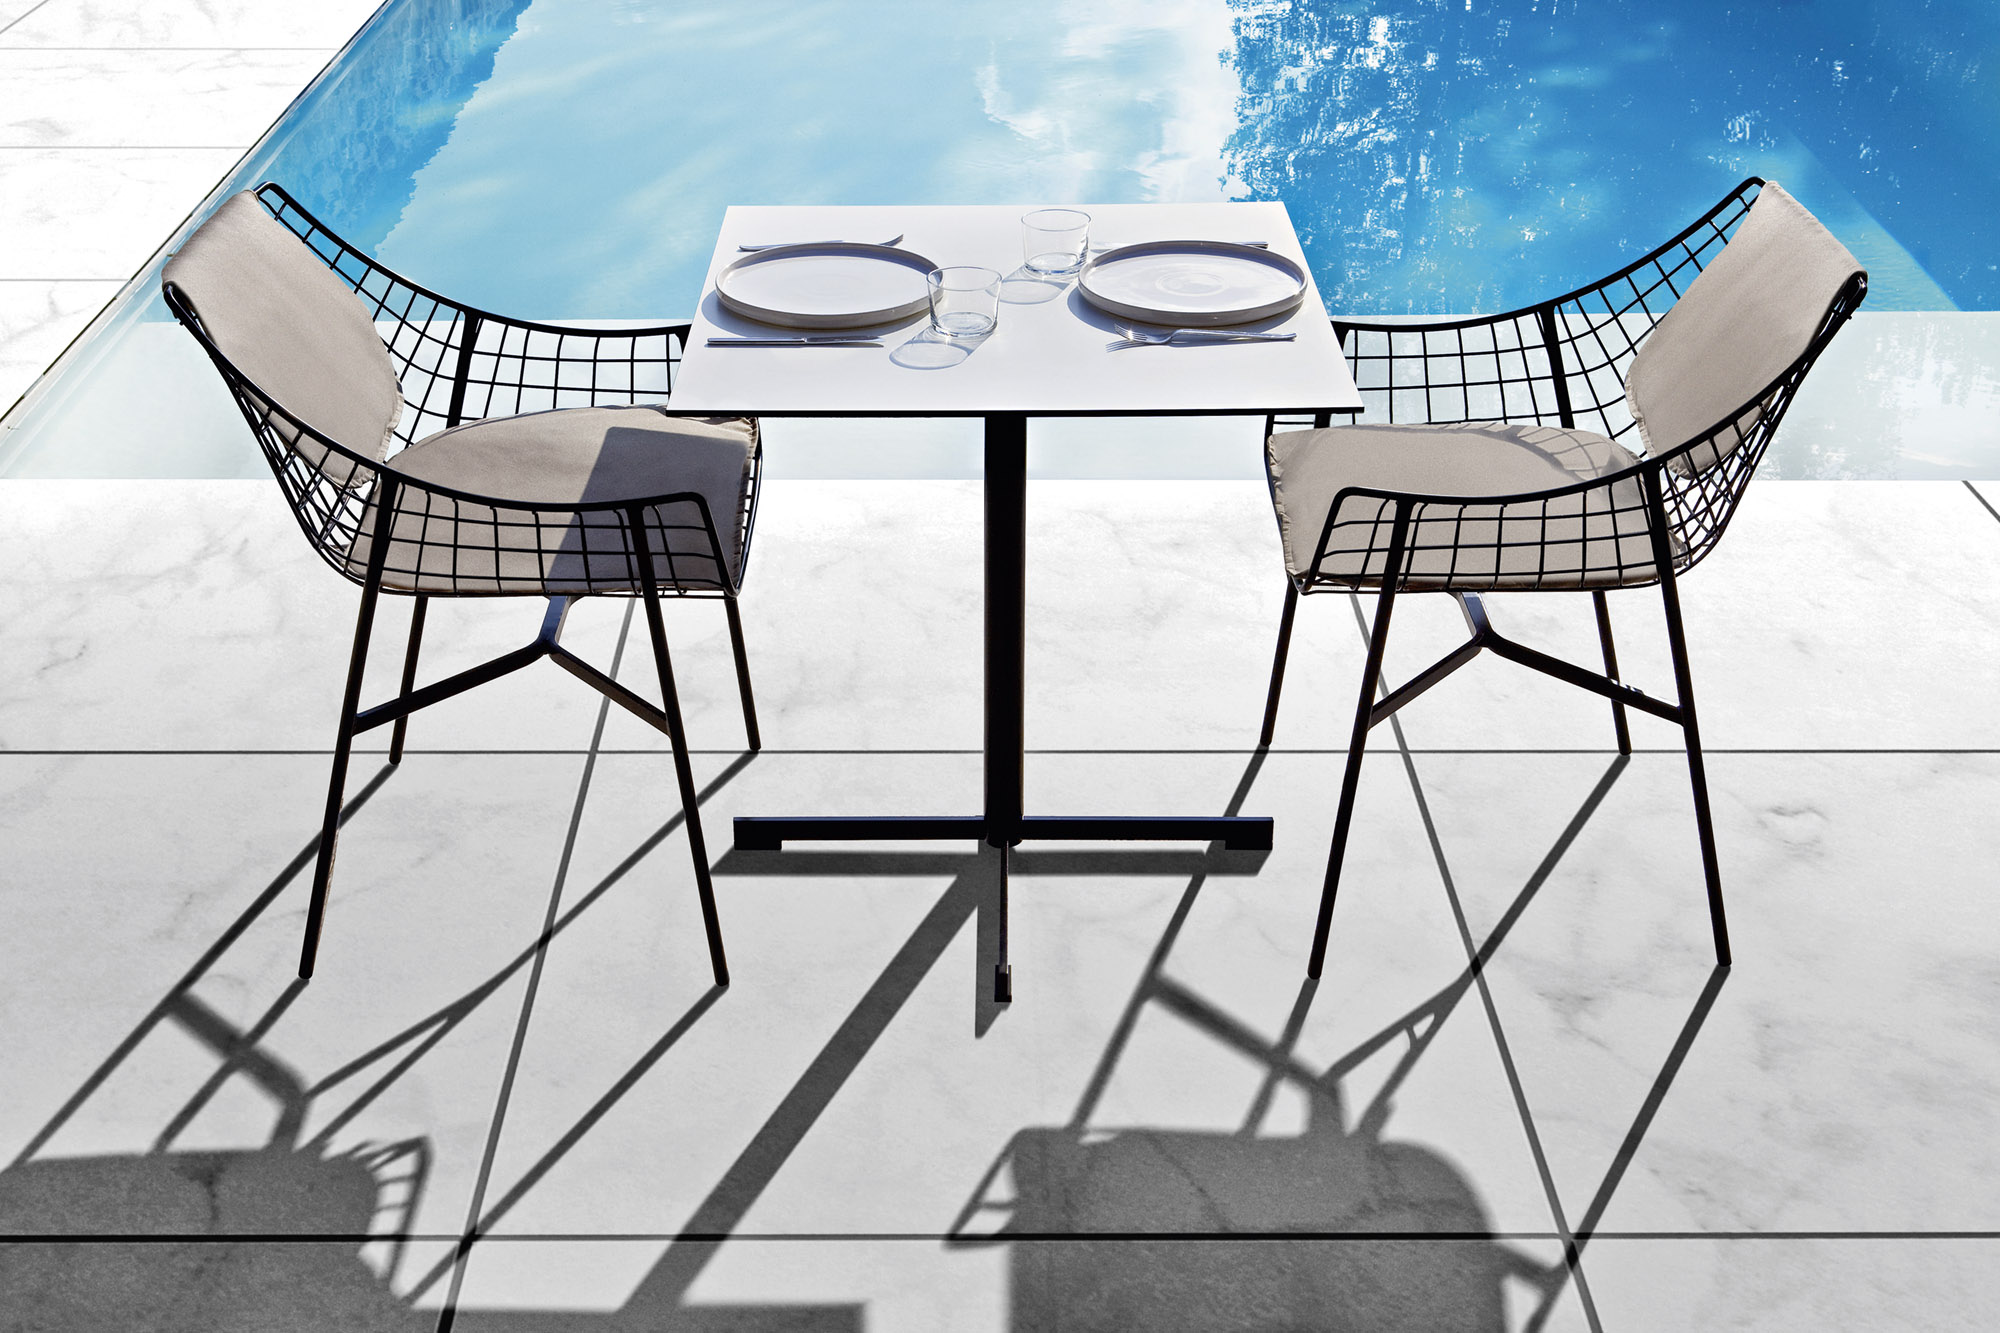 outdoor-varaschin-esterno10C690936A-0B6D-C225-3B9A-493BD42BB202